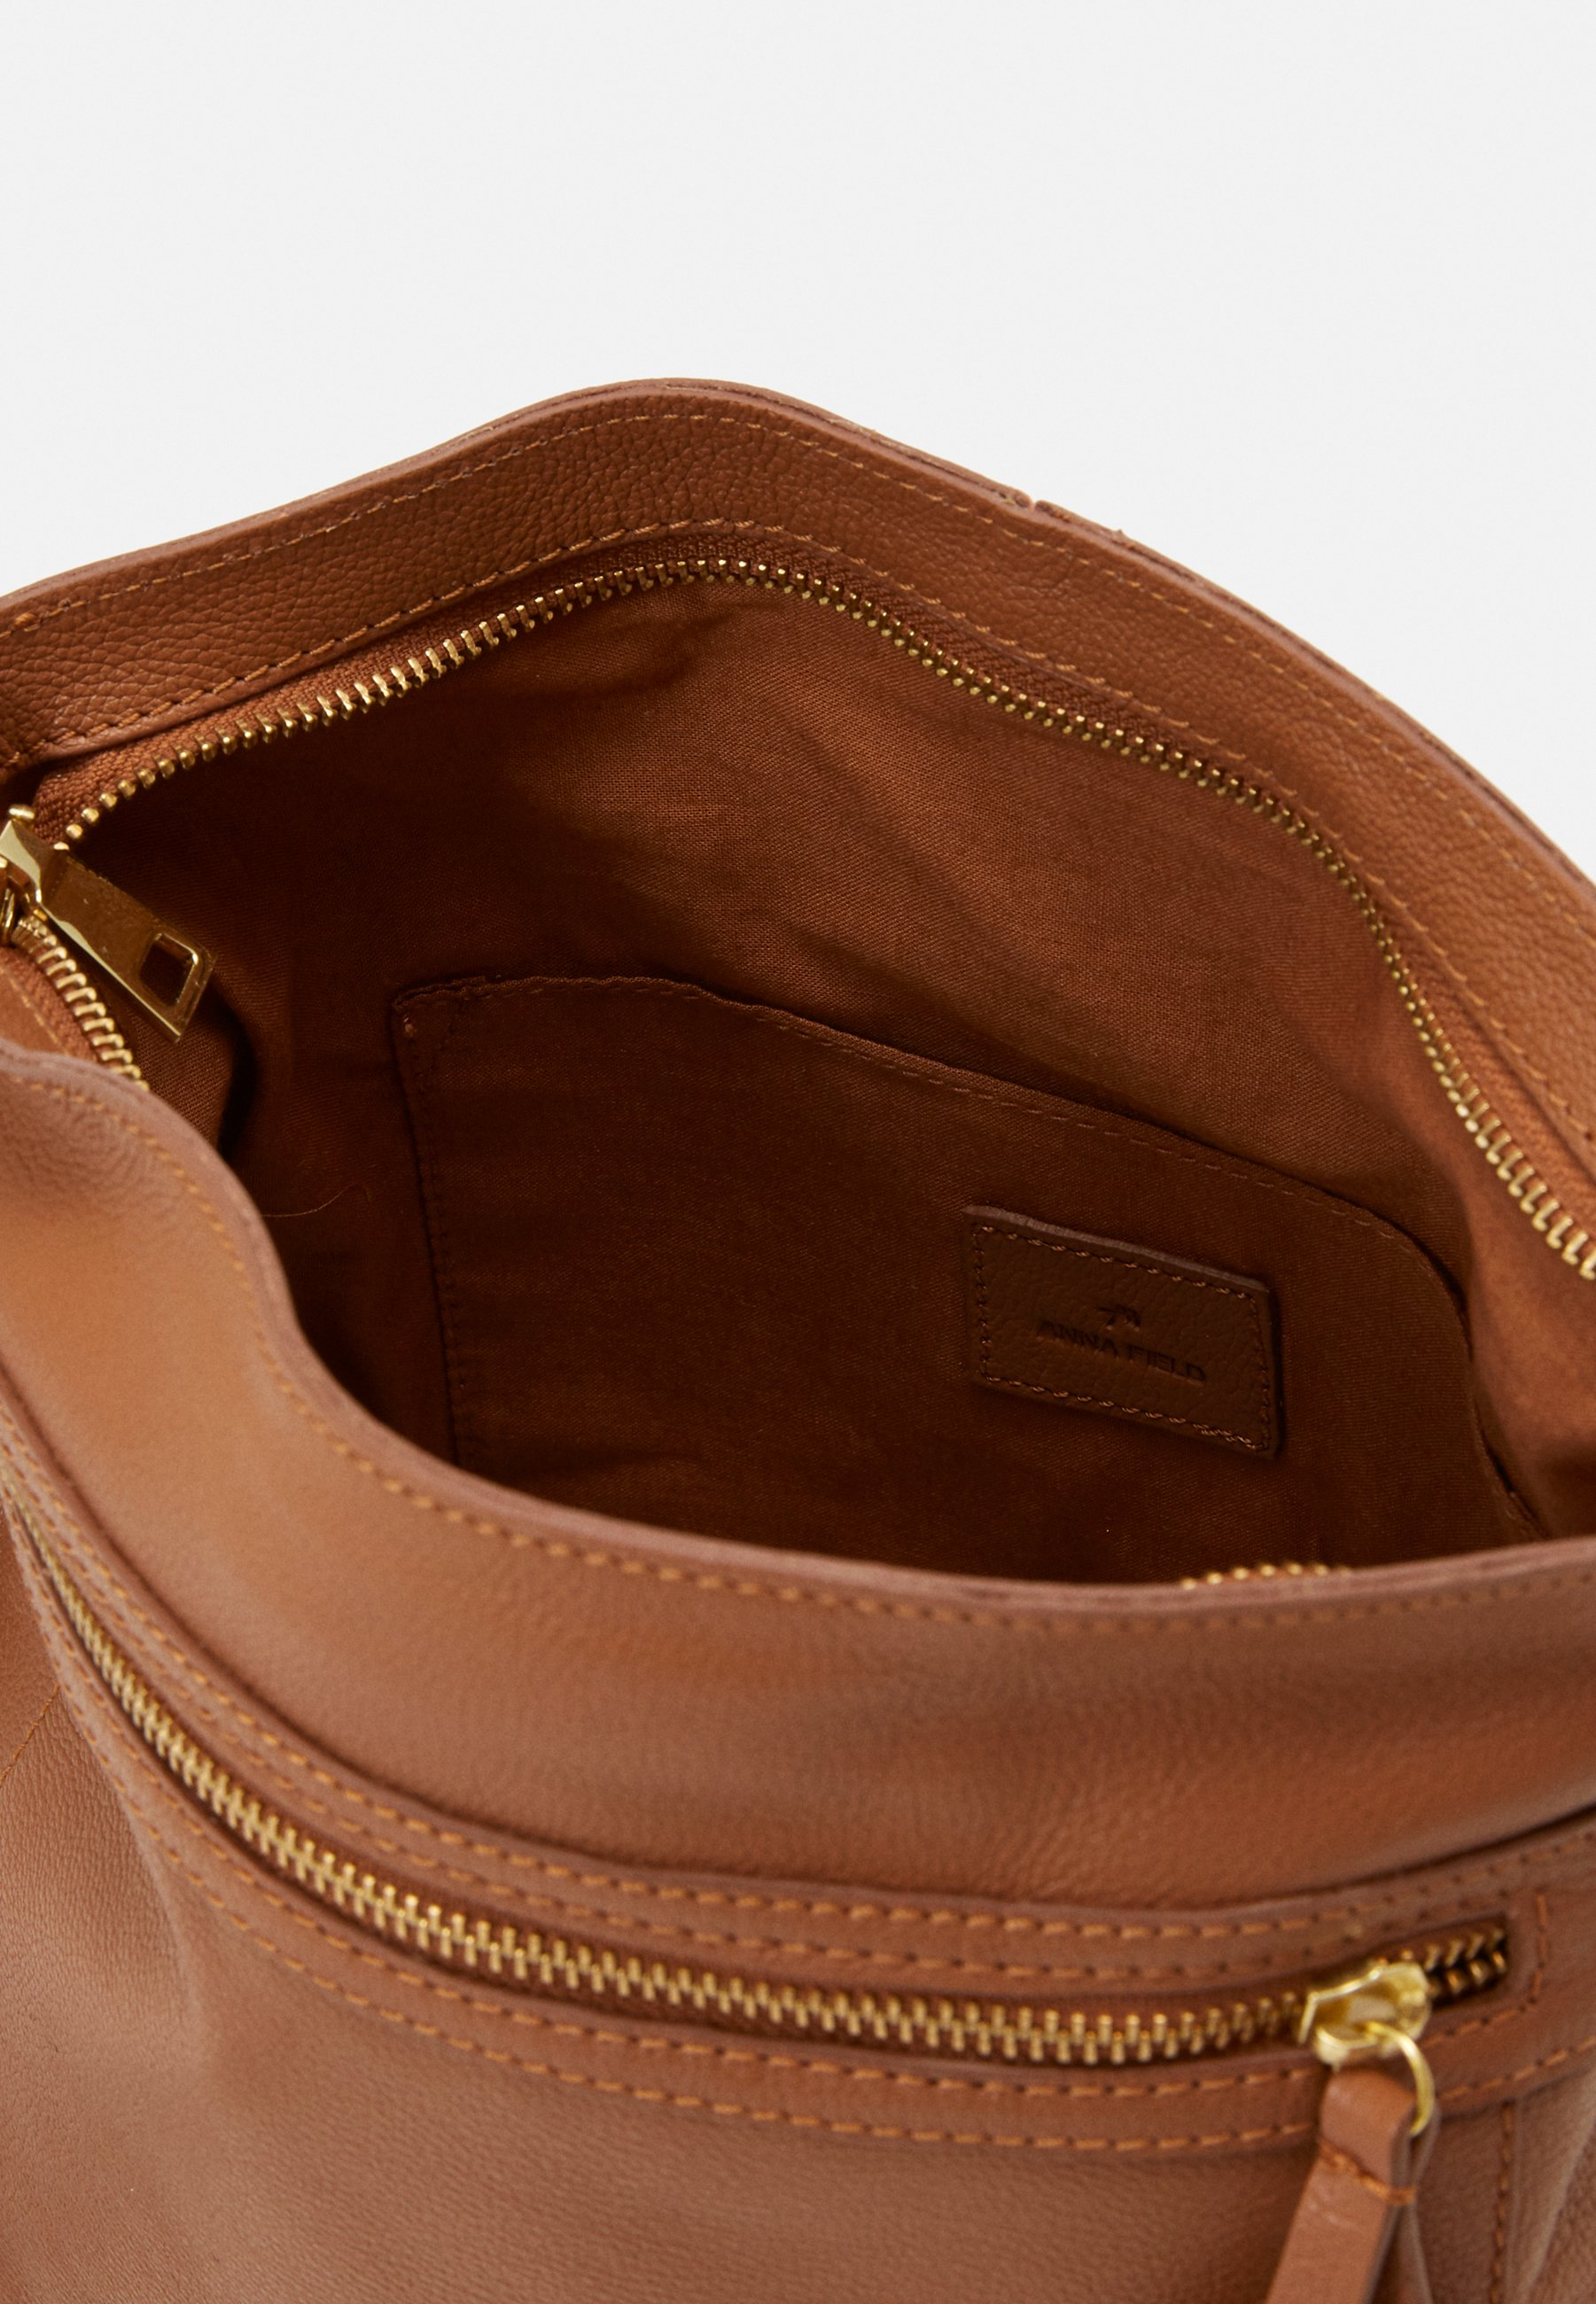 Largest Supplier Bulk Designs Accessories Anna Field LEATHER Across body bag cognac LcDydo8QL N4YCtuIDe